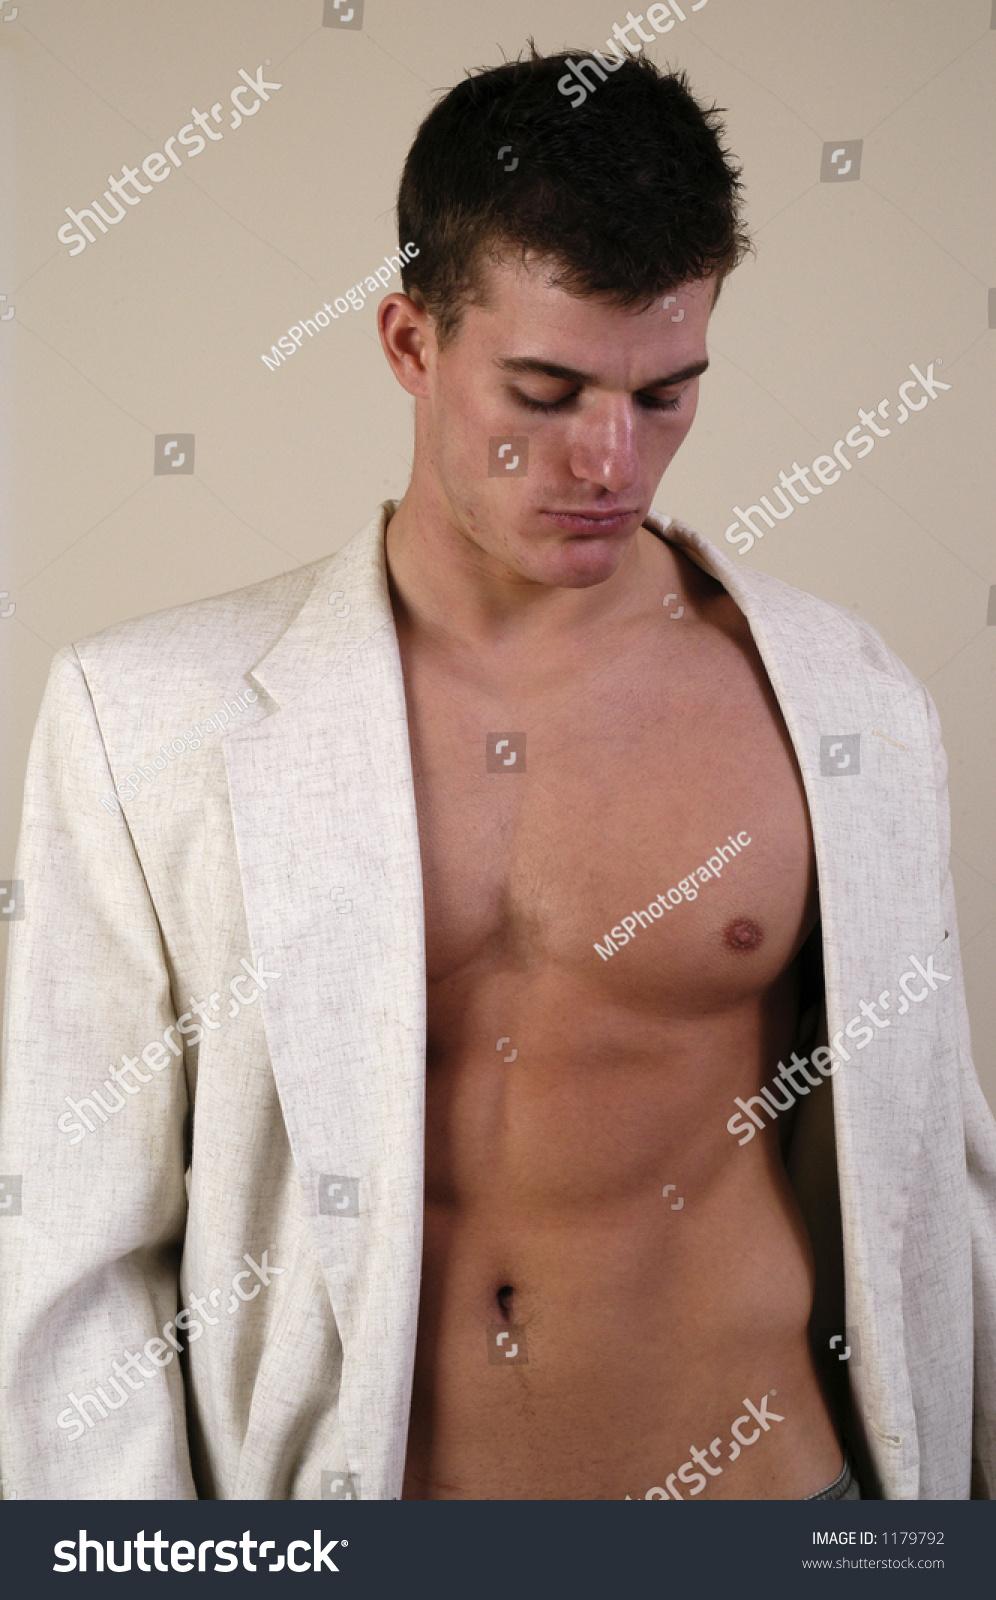 Man Suit Jacket No Shirt Stock Photo 1179792 - Shutterstock